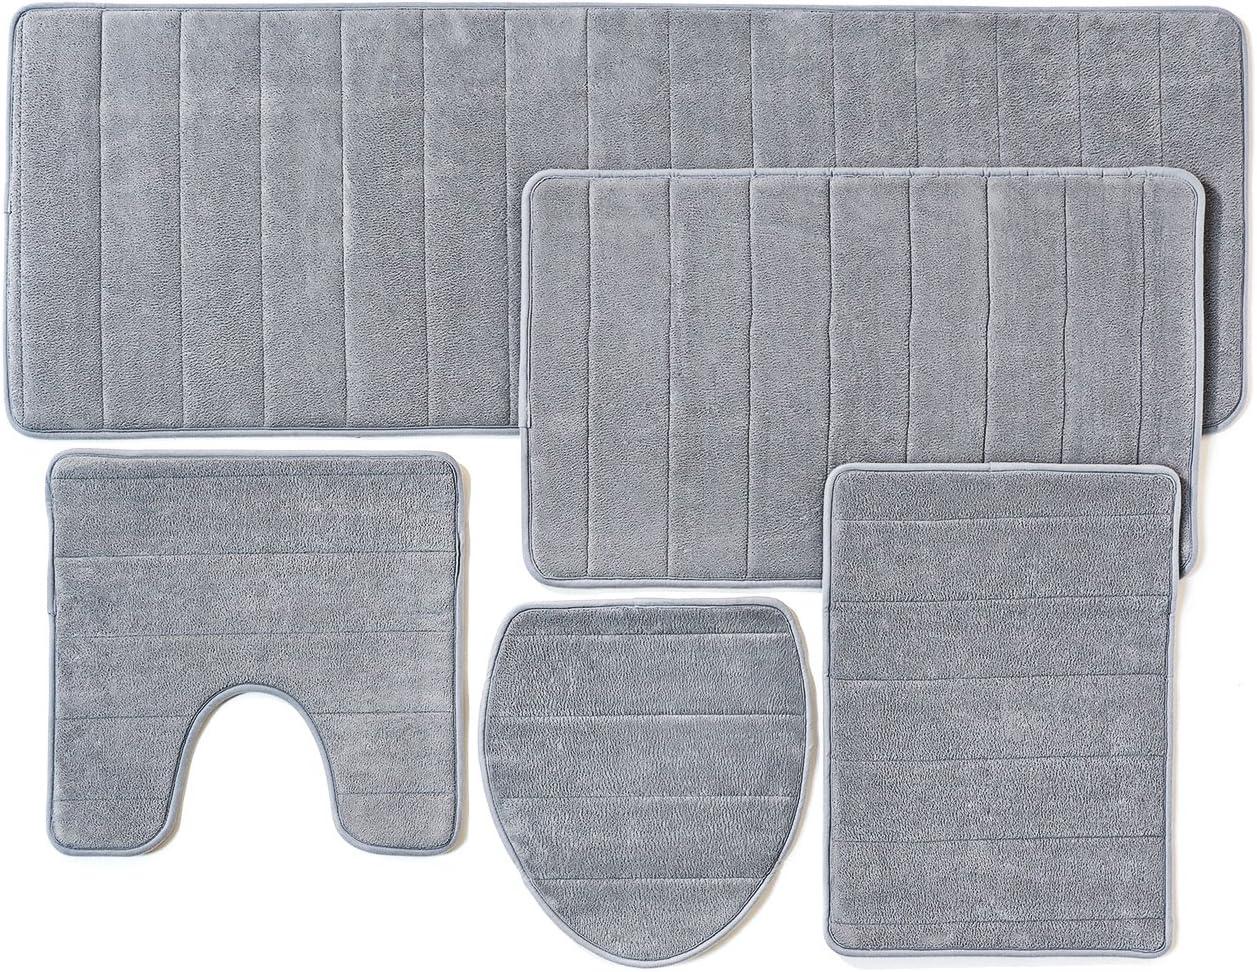 Amazon Com Over The Floor Bathroom Rug Mat 5 Piece Set Memory Foam Extra Soft Non Slip Back Color Gray Pantone 15 4101 Tpx Kitchen Dining